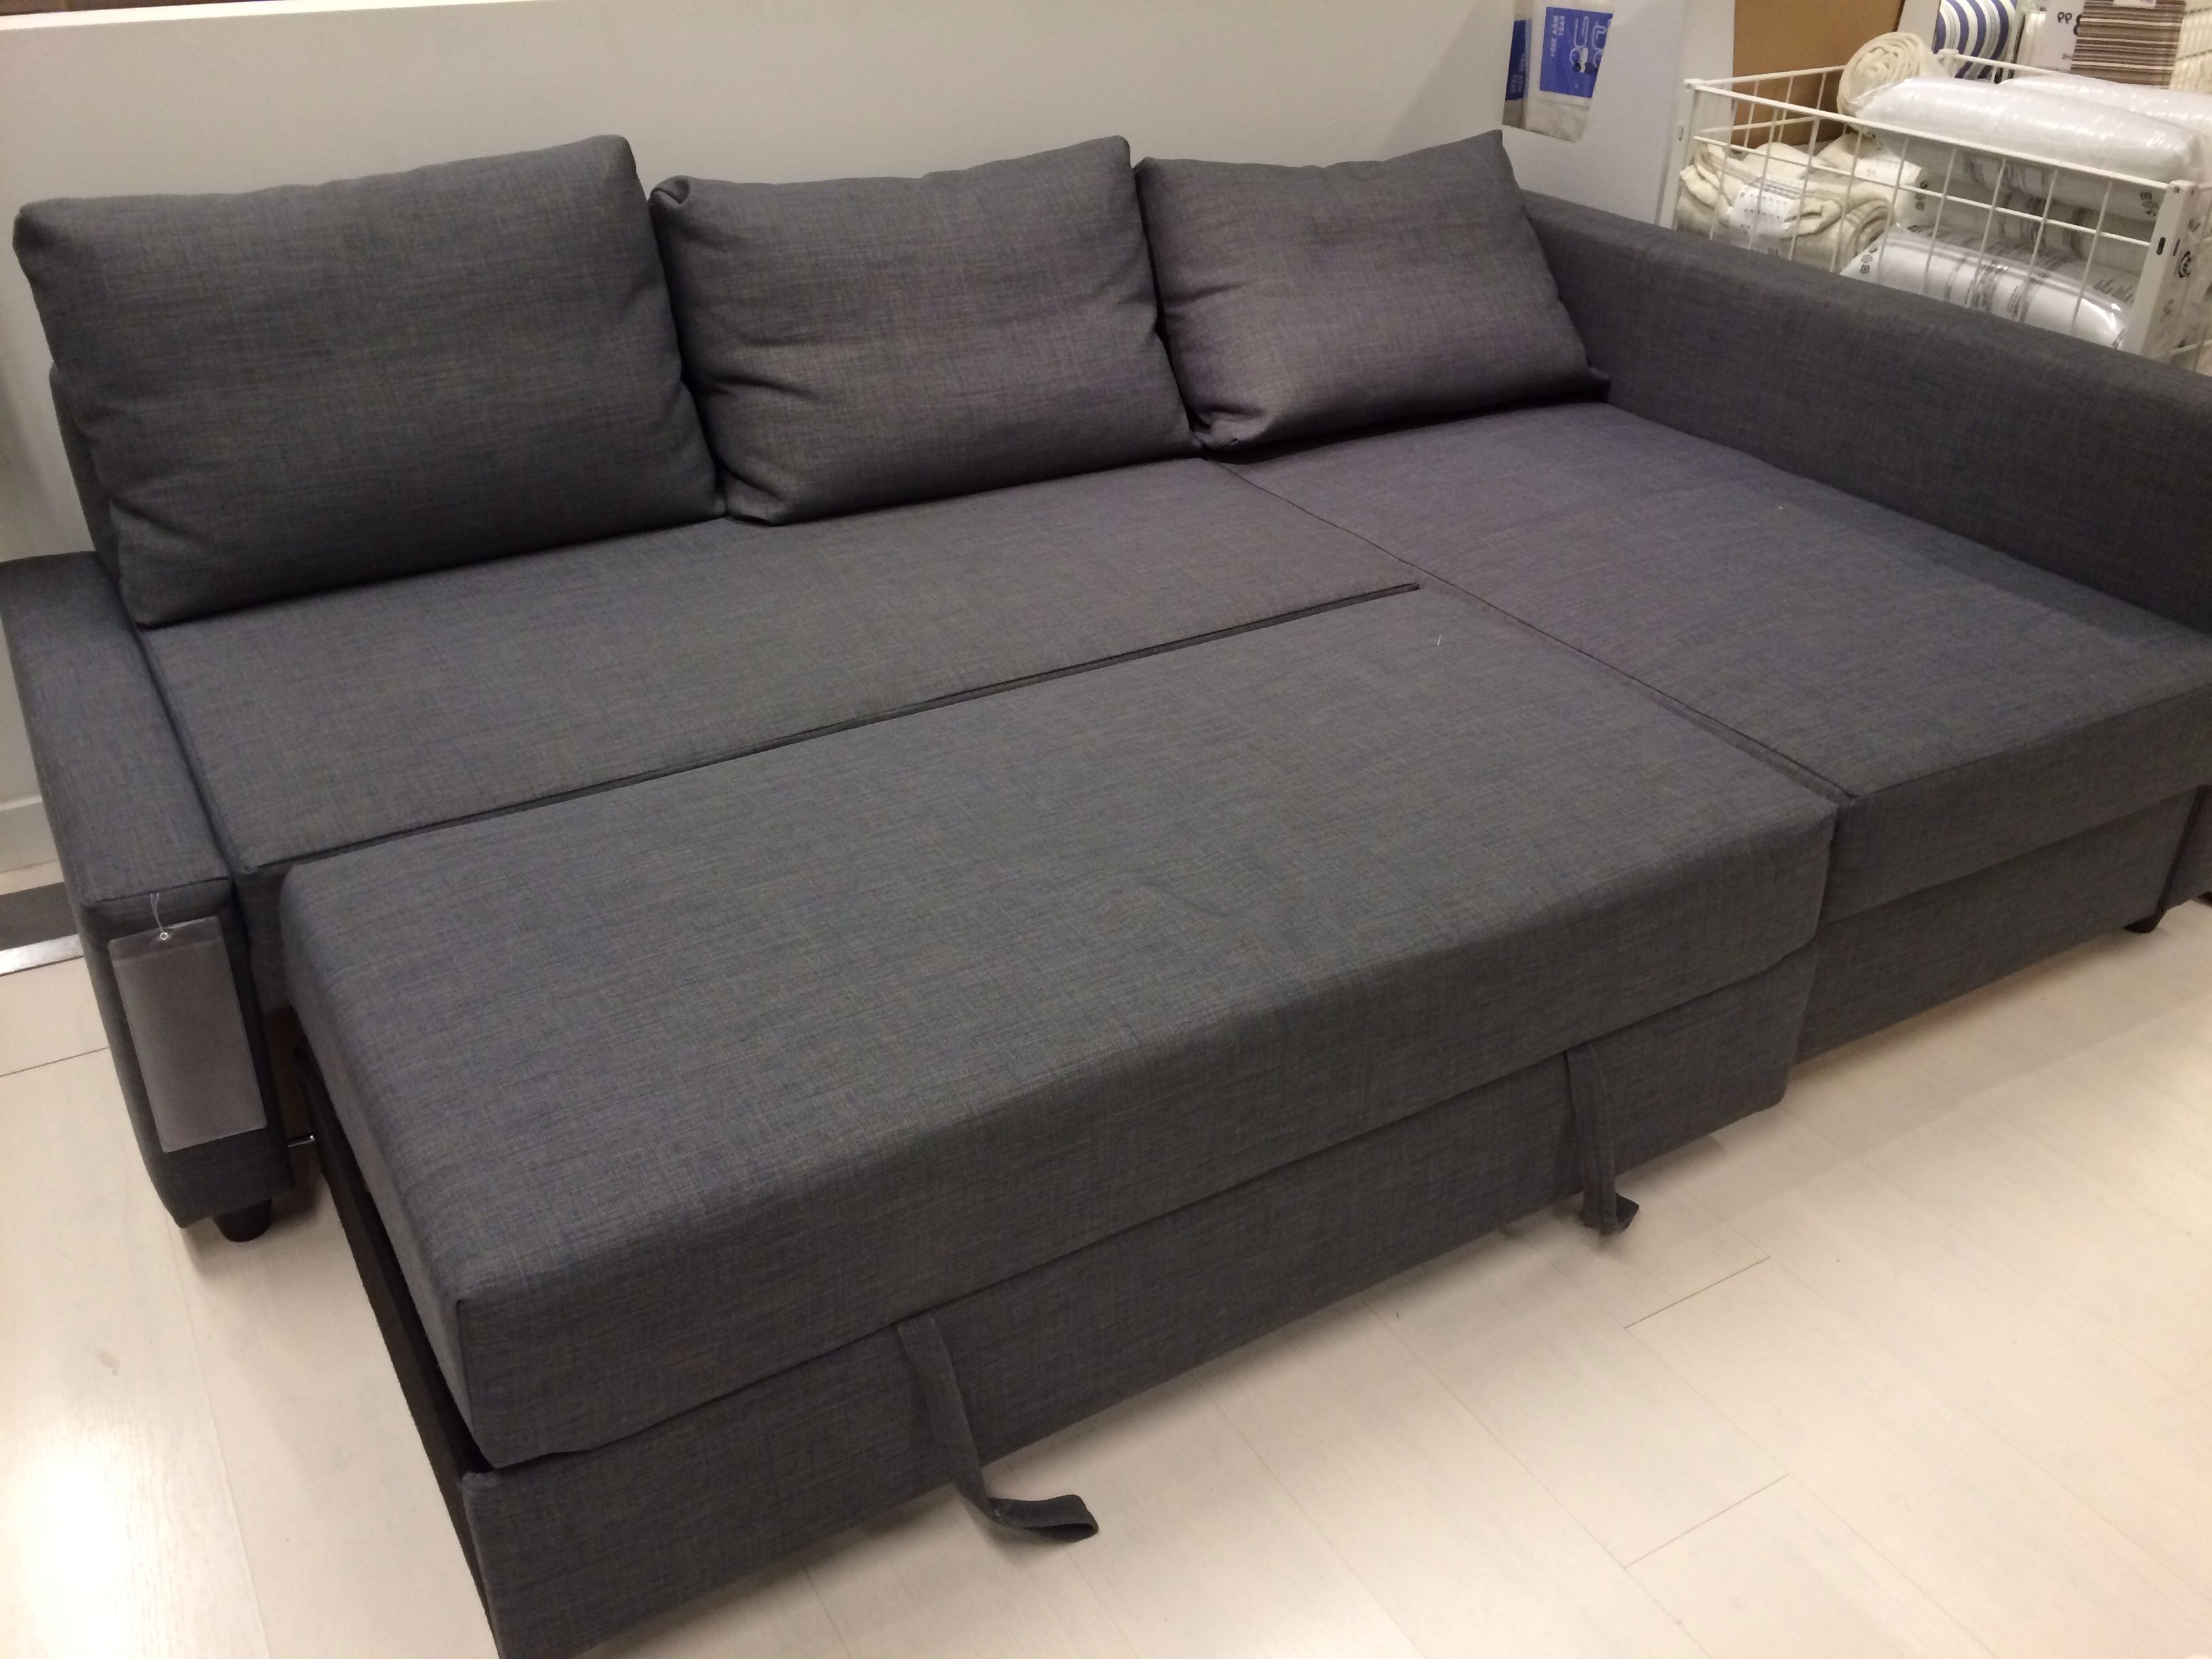 Sofa Friheten Txdf Friheten Corner sofa Bed Skiftebo Dark Grey Ikea for ashleigh